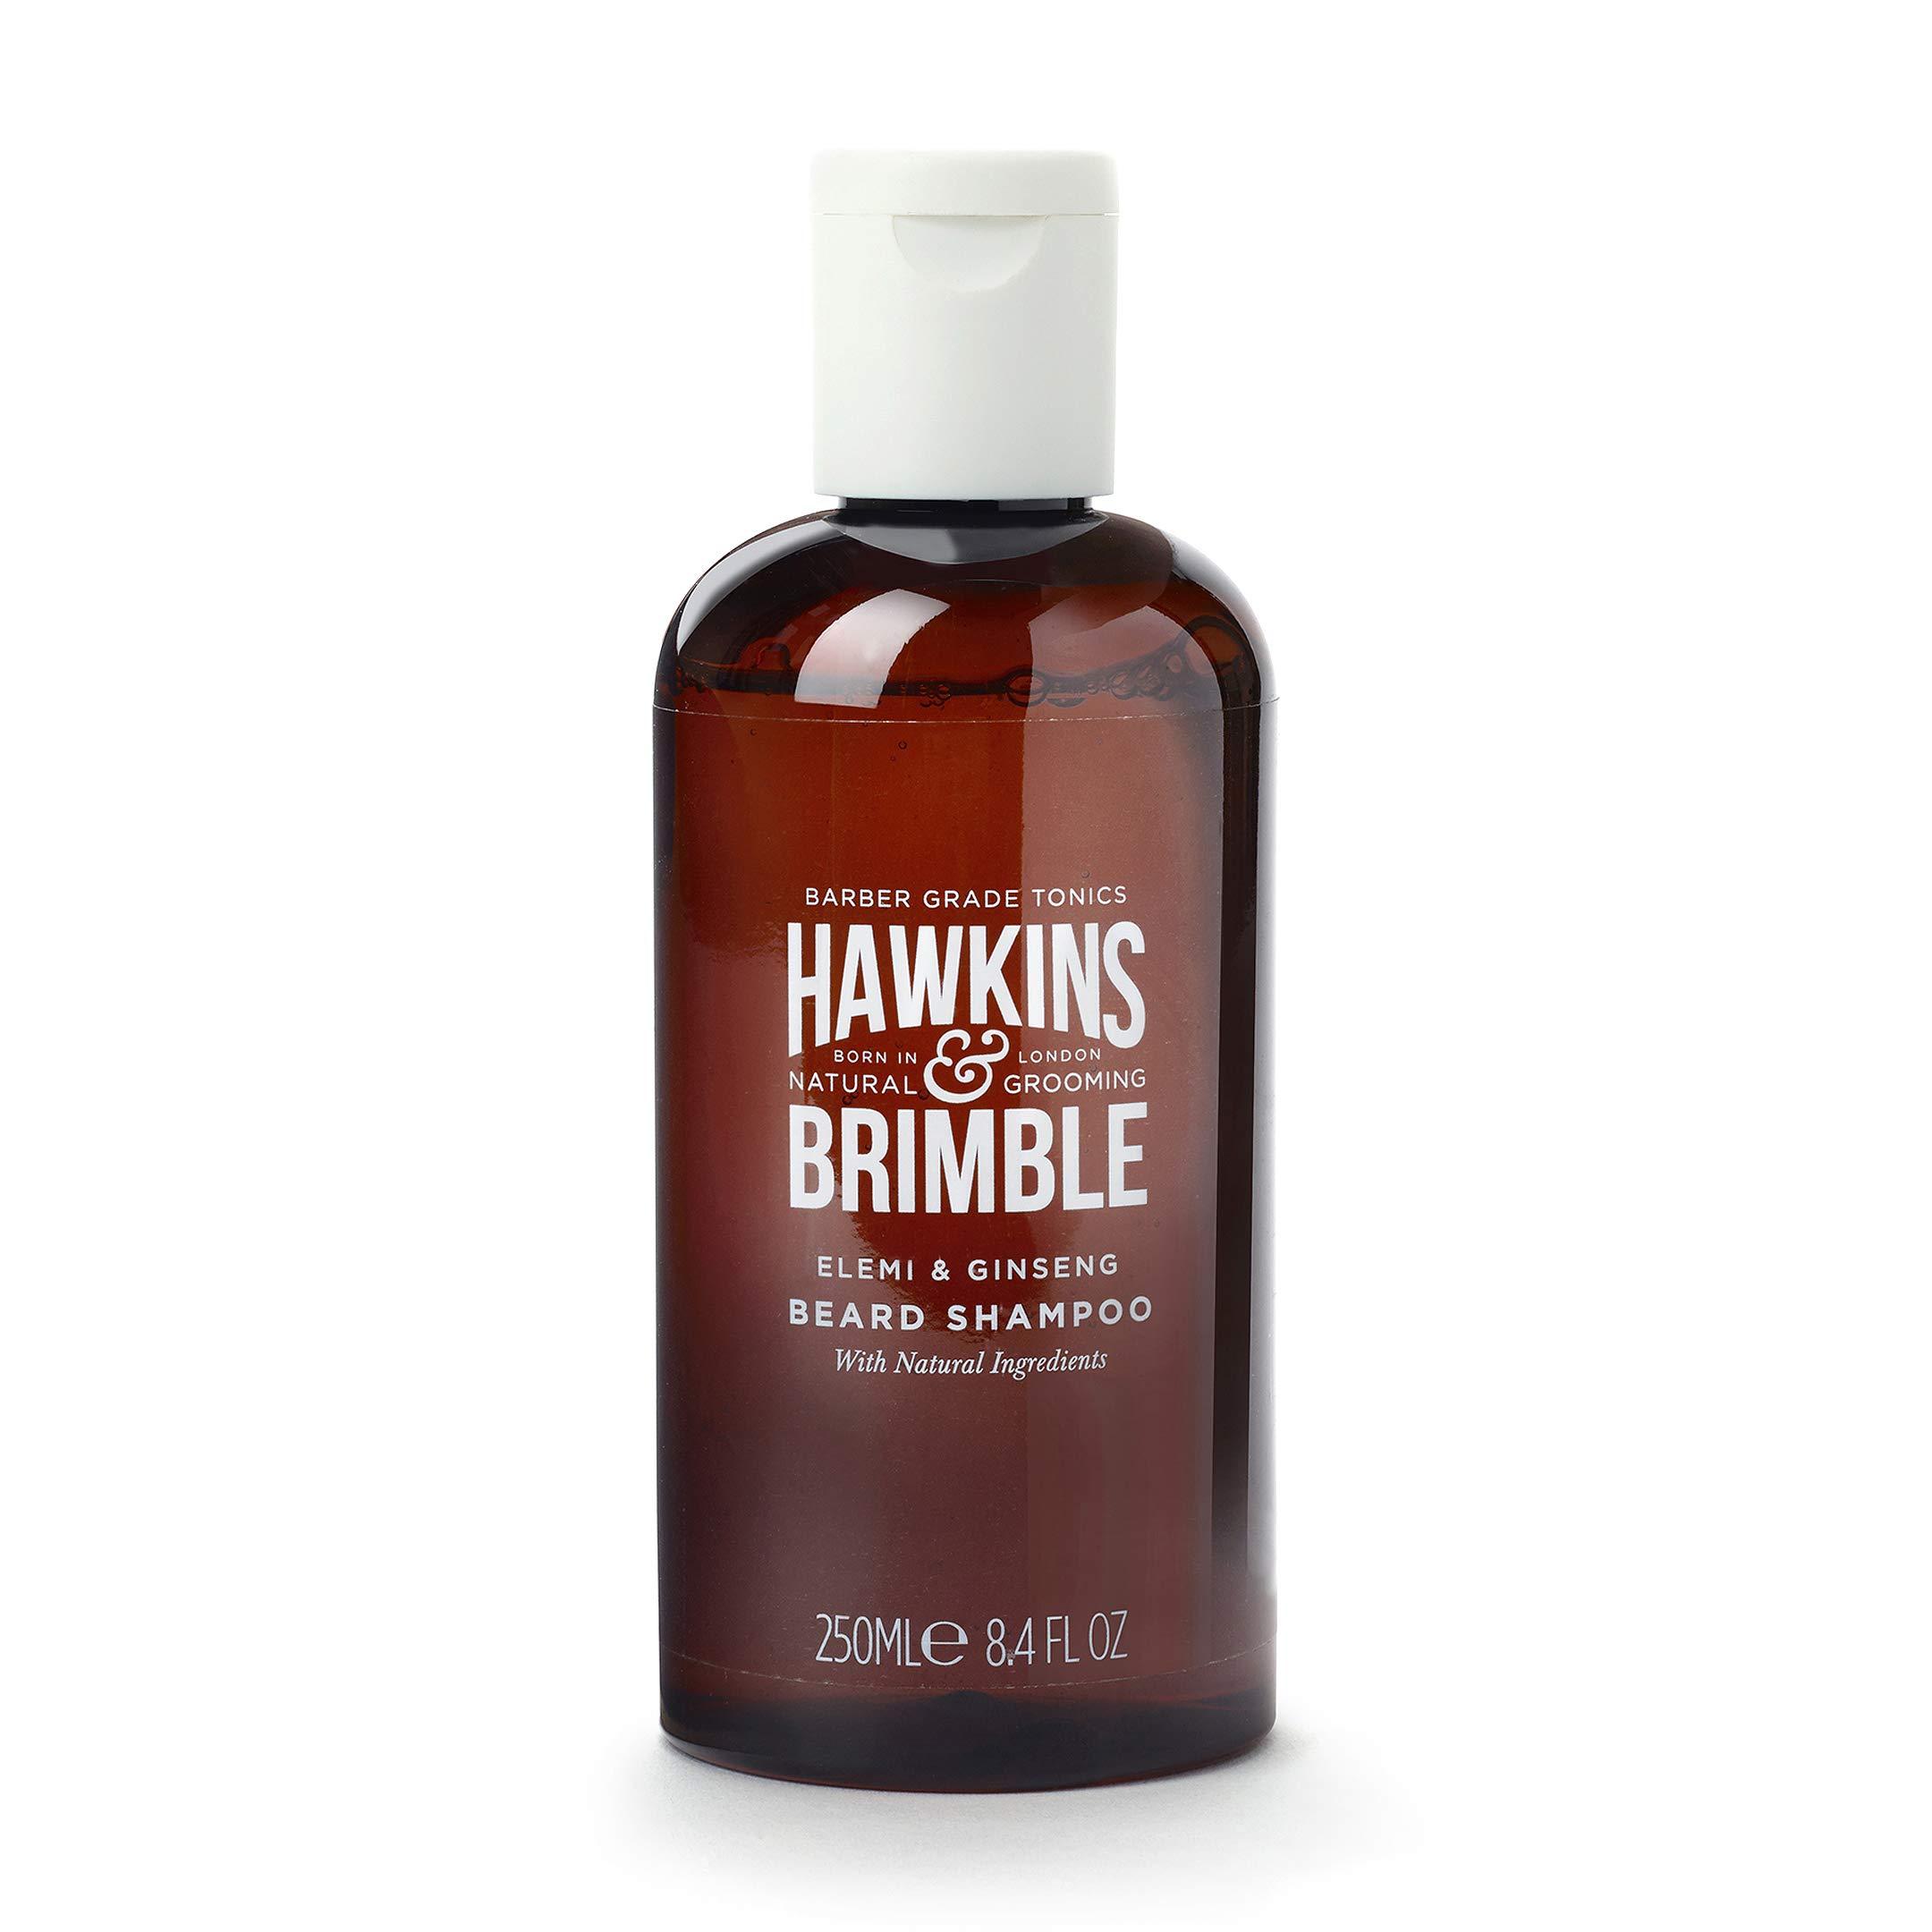 Hawkins & Brimble Beard Shampoo for Men, 250ml - Wash Softens Support Growth & Maintain Chin Fuzz